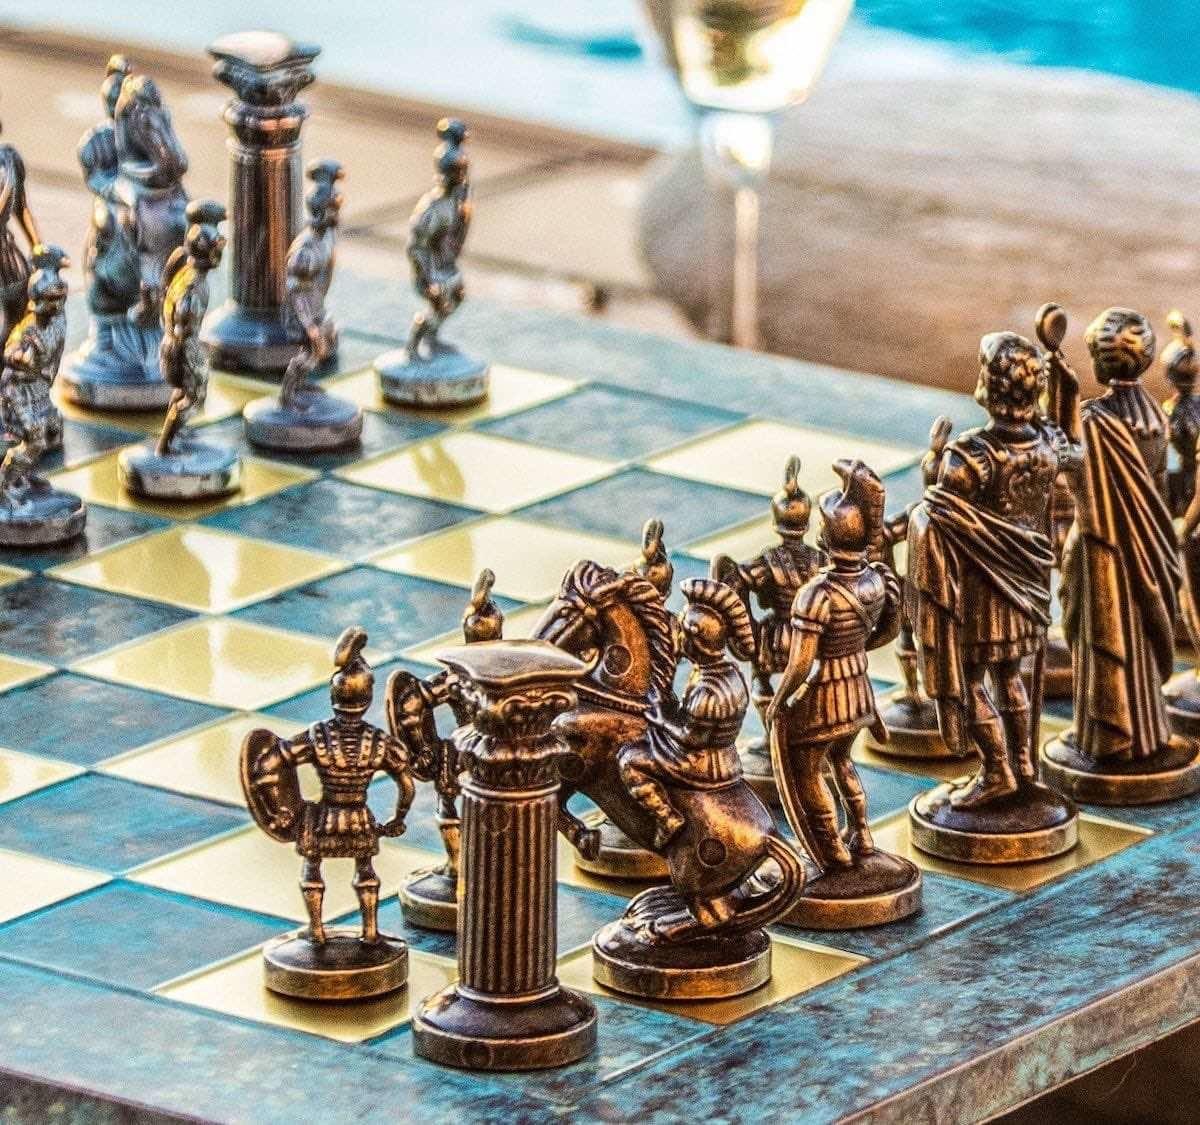 Hellenic Art Spartan Hoplites Elaborate Chess Set has a gorgeous, display-worthy design